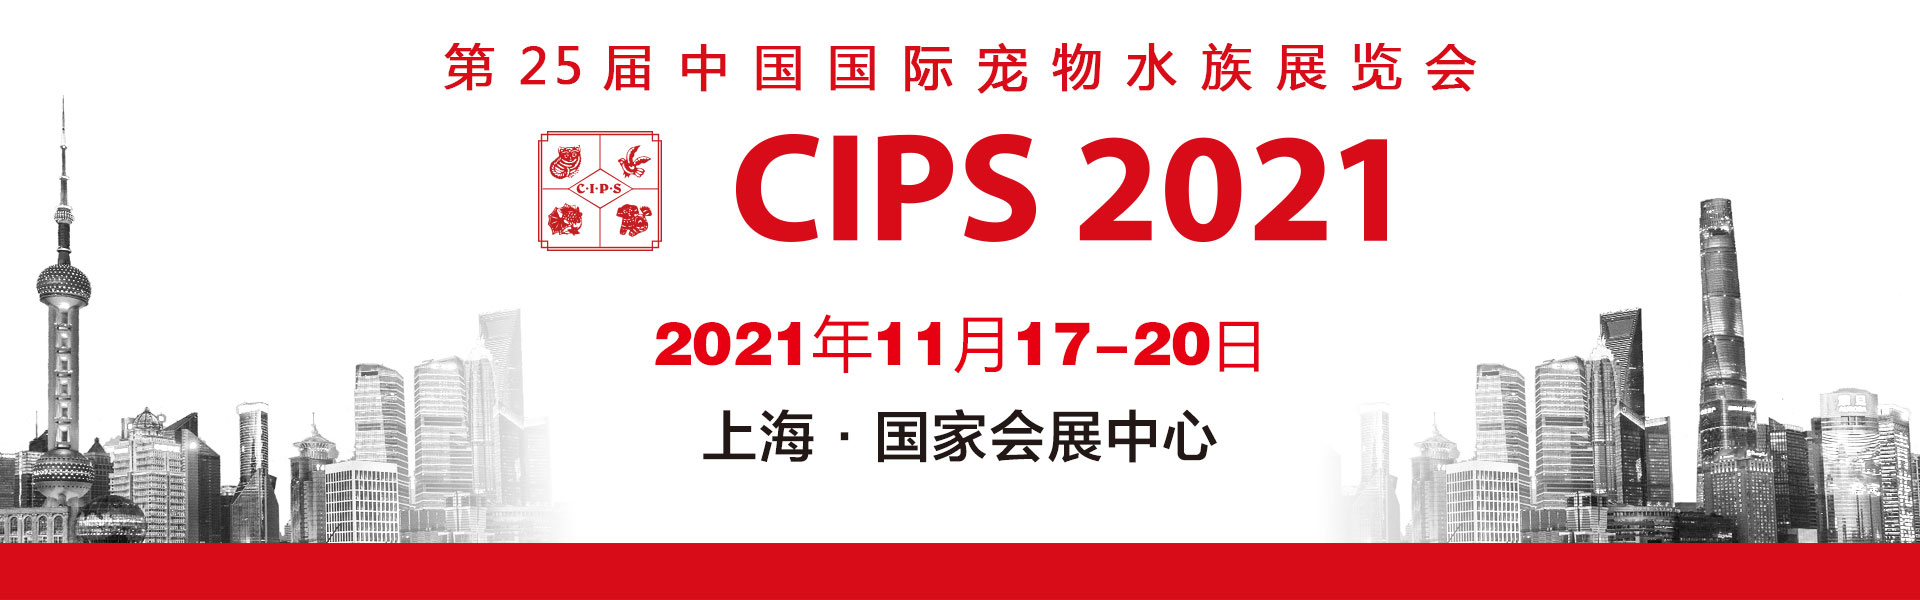 首页大图-CIPS2021